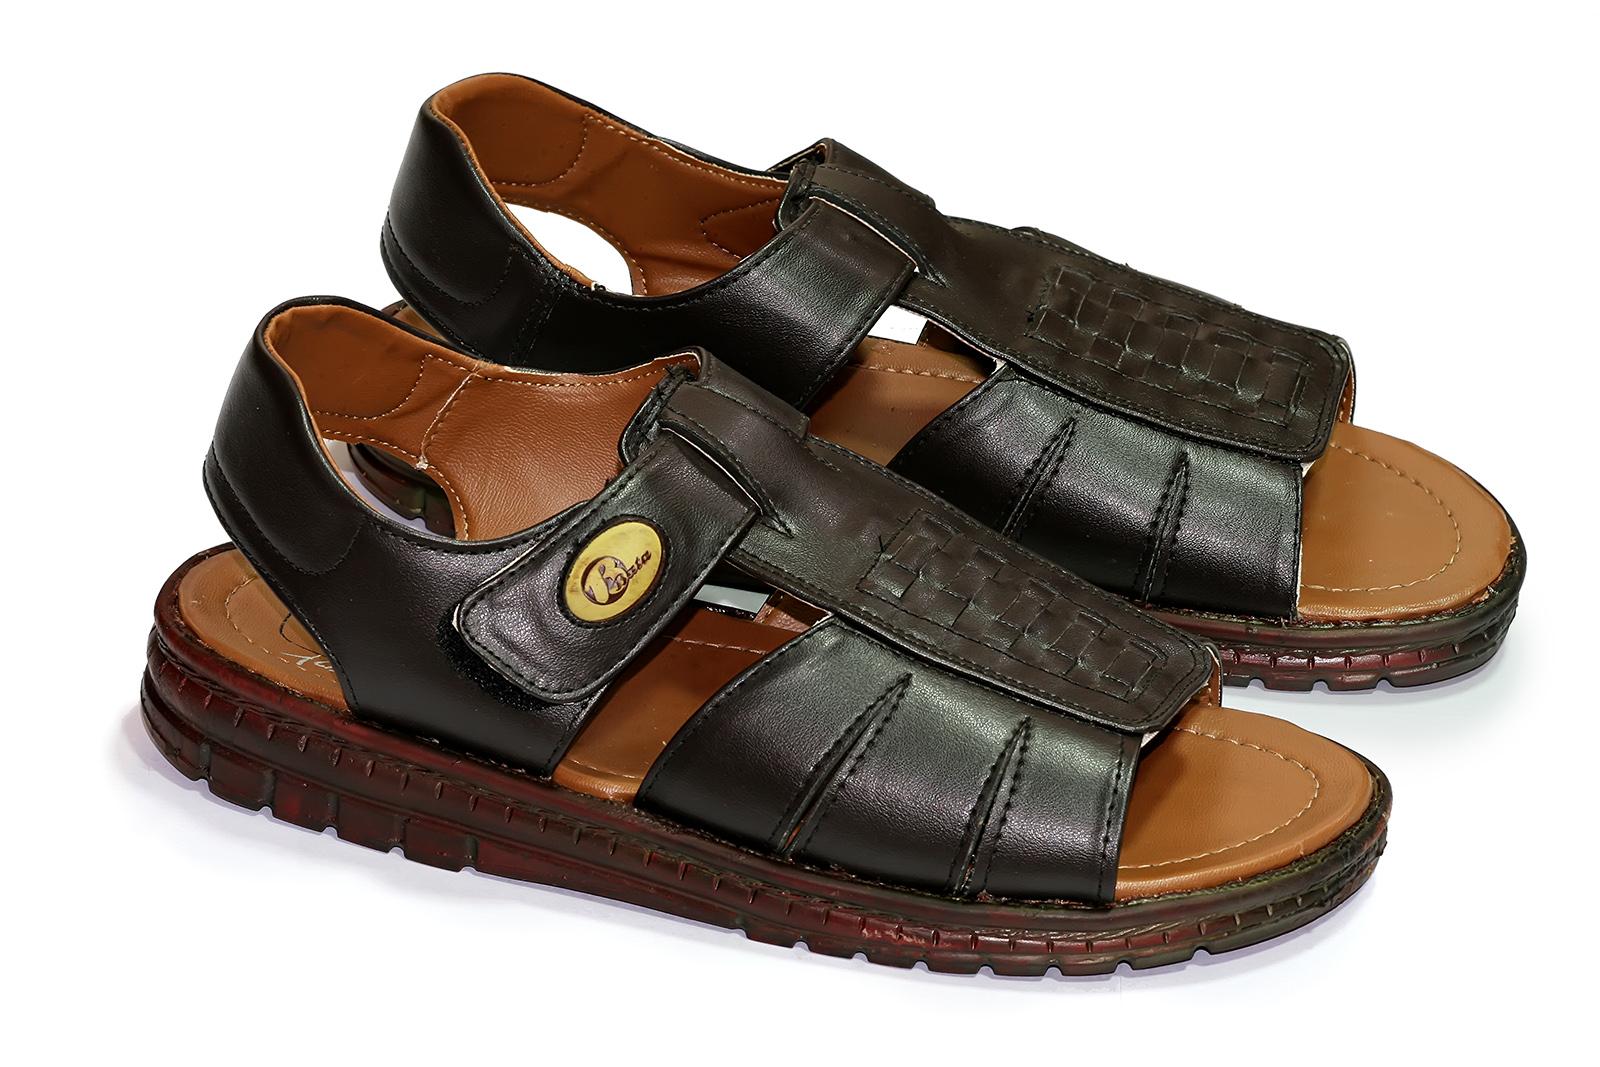 Fanning Mens Sandals | Bottle Opener Flip Flops For Men